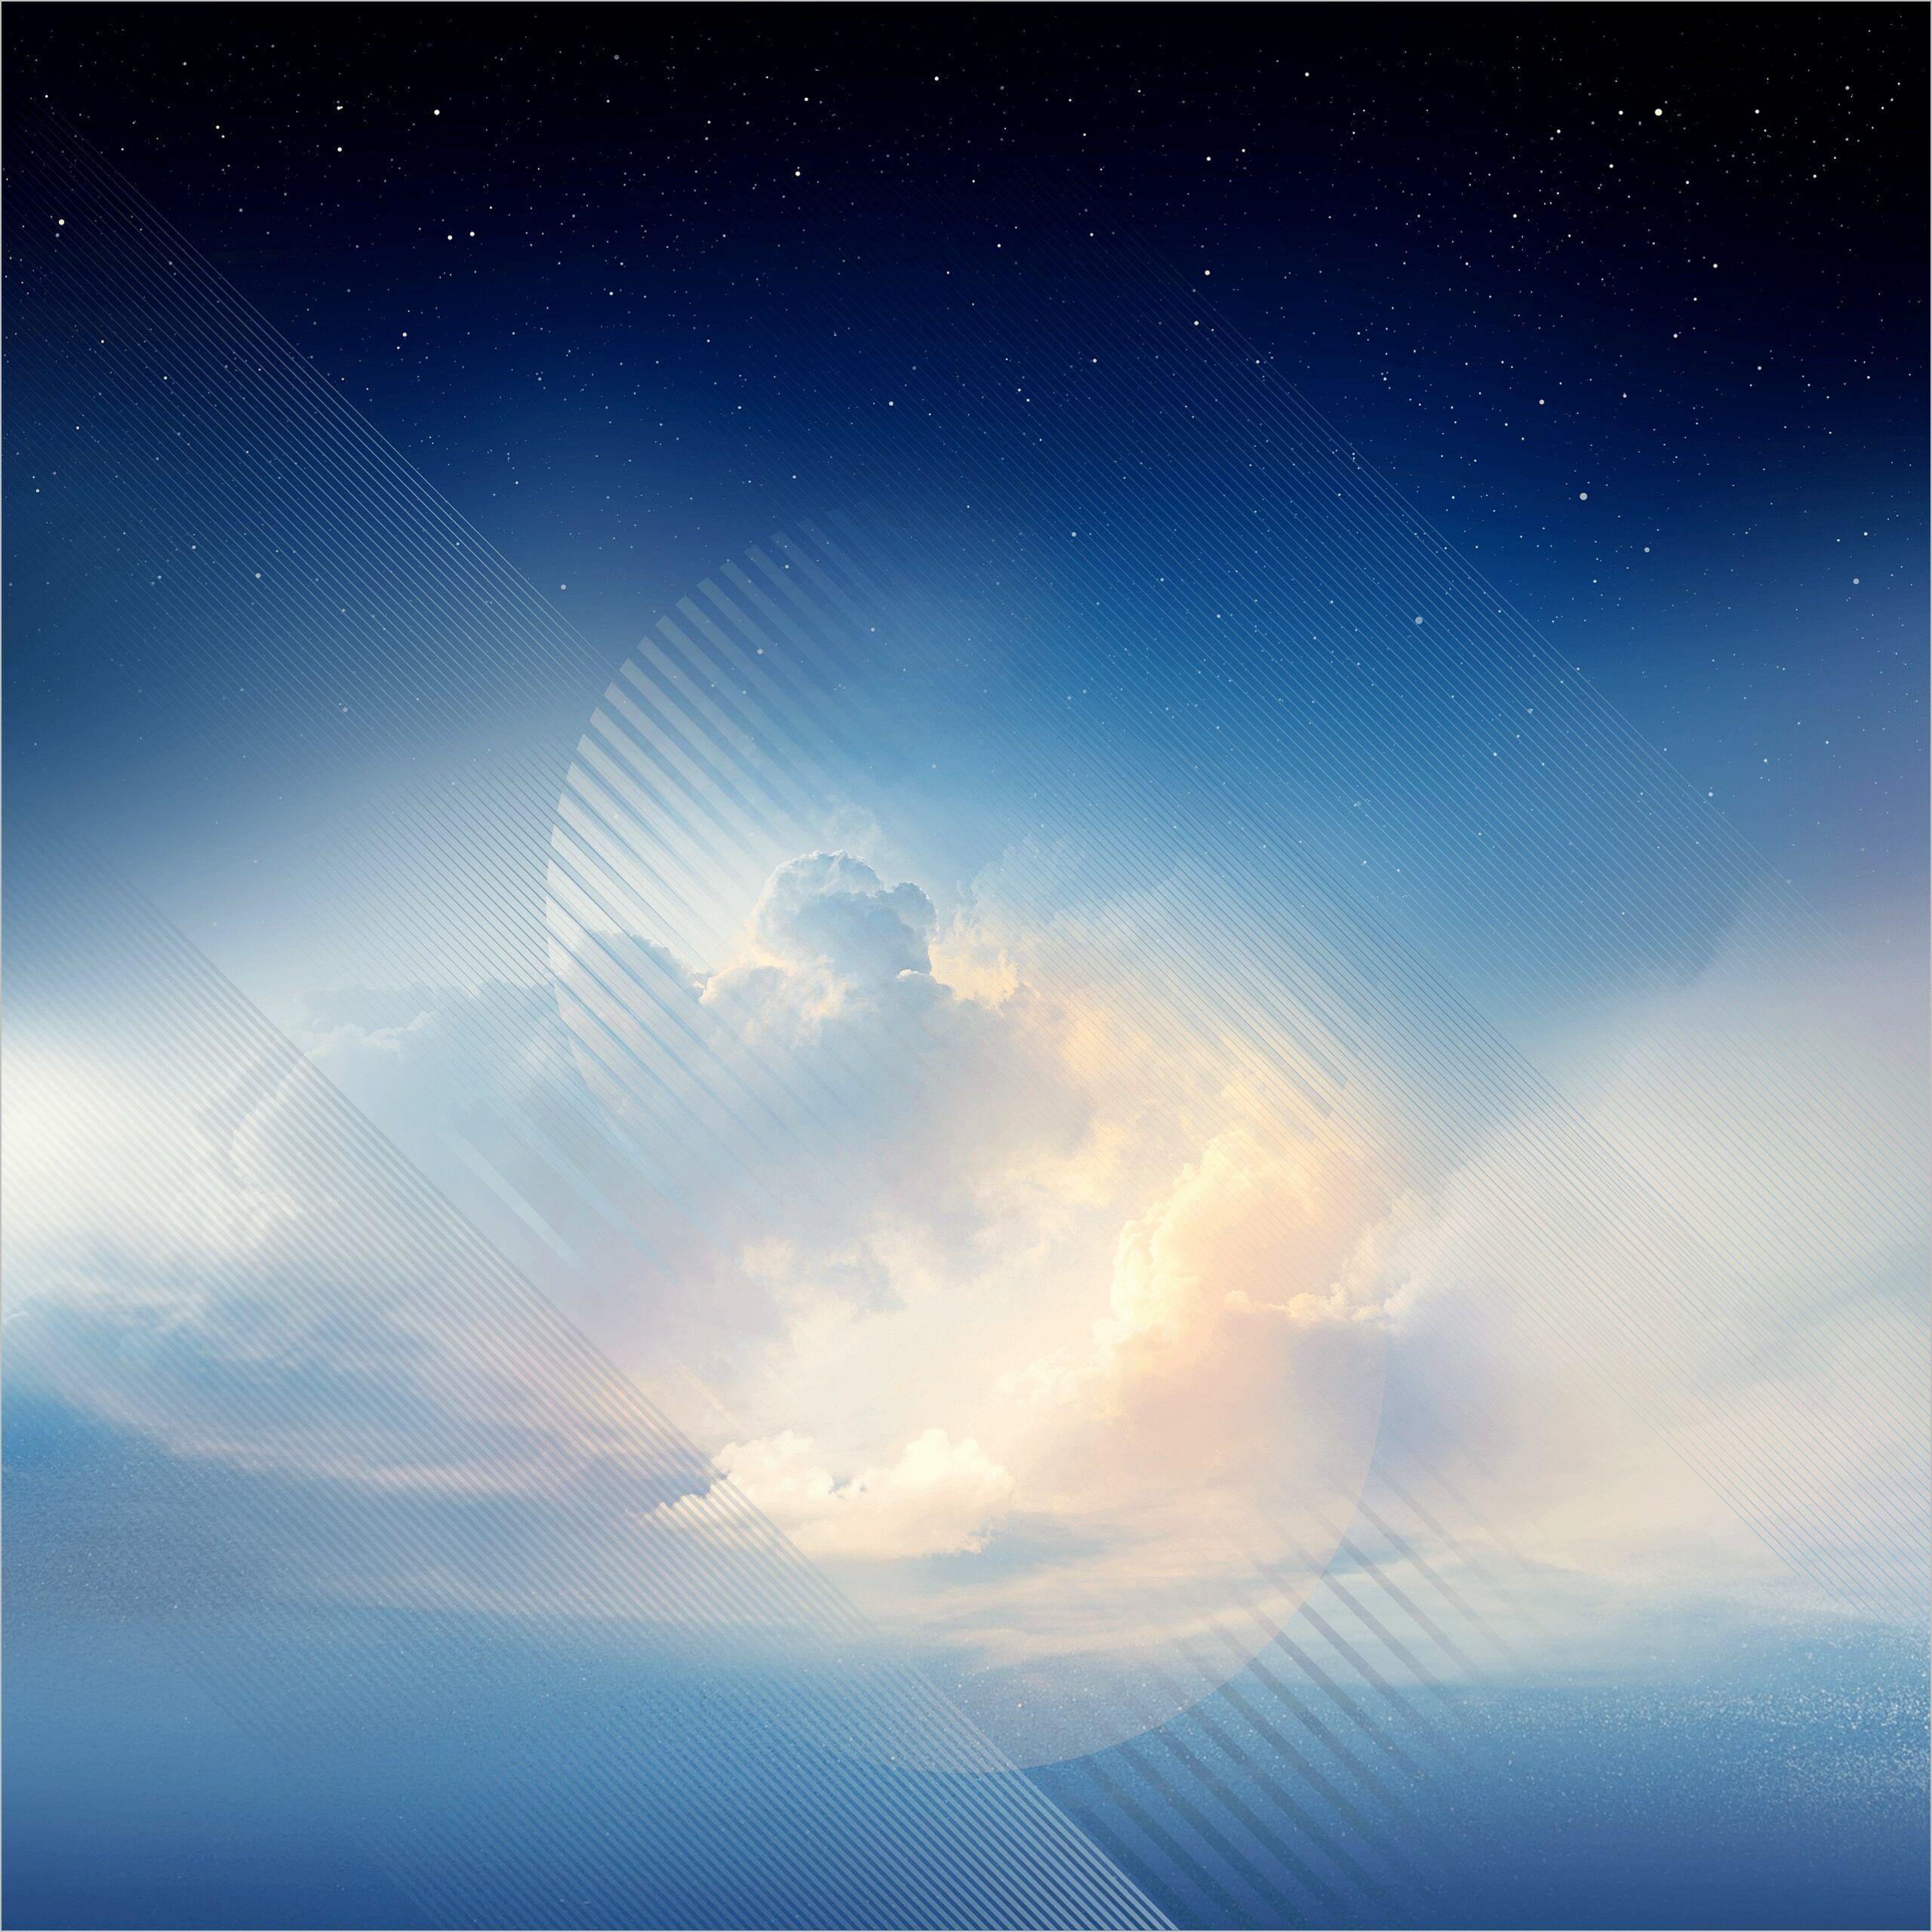 Note 8 Original Wallpaper 4k In 2020 Infinity Wallpaper Blue Sky Wallpaper Galaxy Note 8